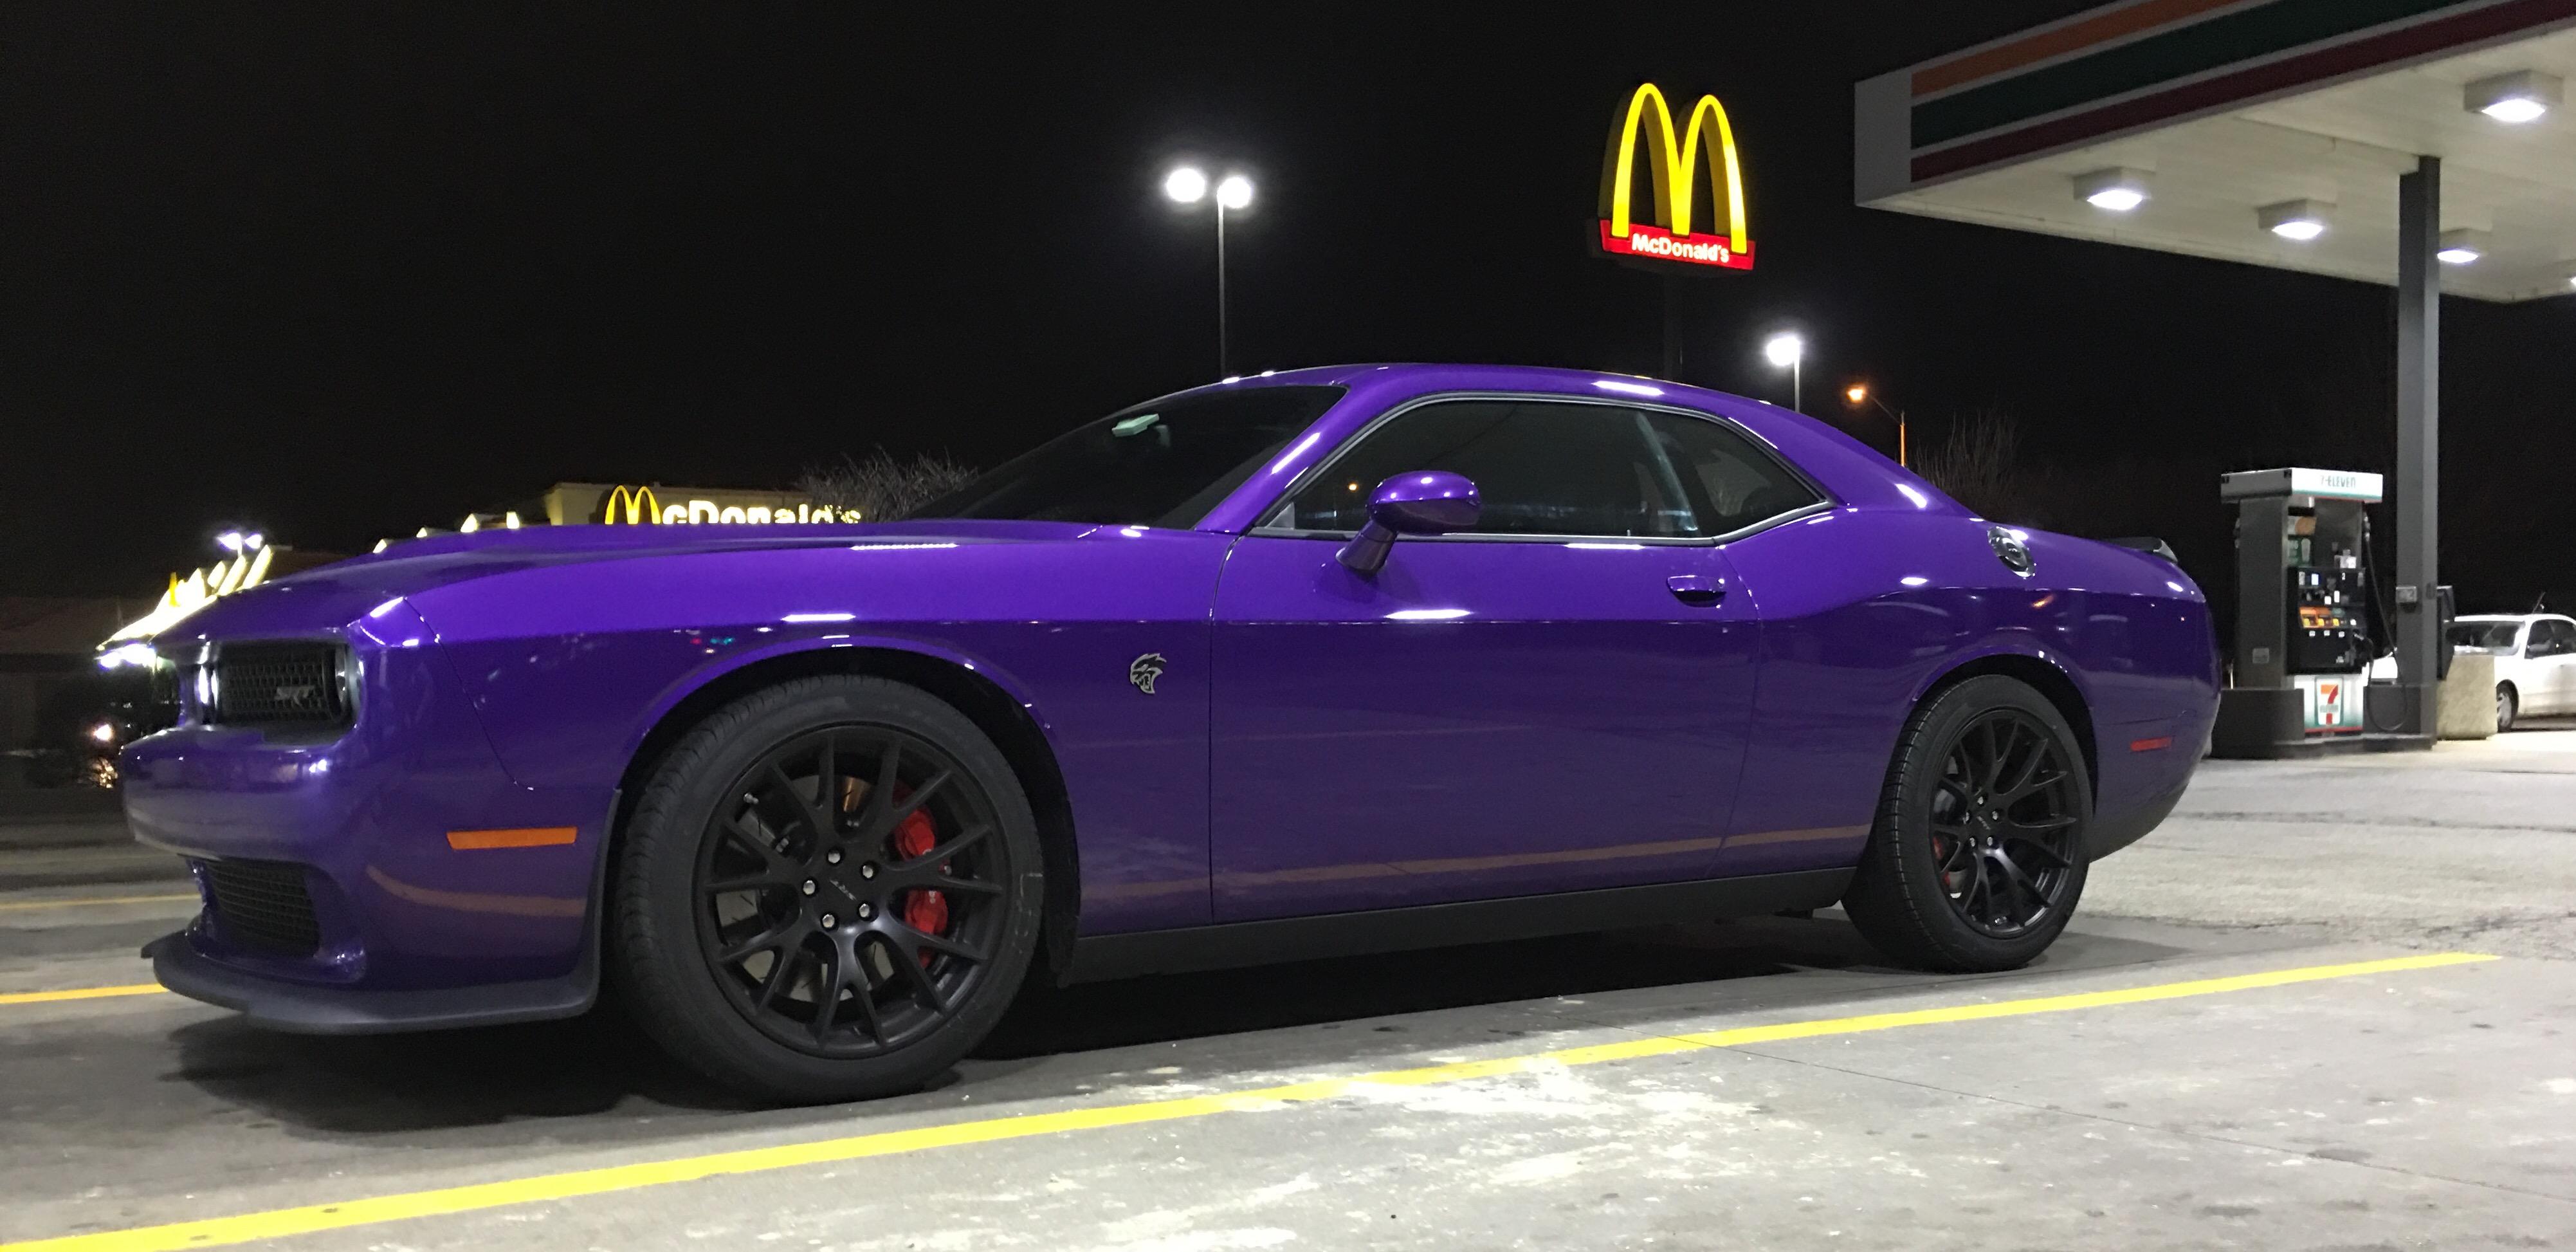 2015 Dodge Challenger Srt Hellcat >> Plum Crazy Purple Hellcat Photos | Page 13 | SRT Hellcat Forum